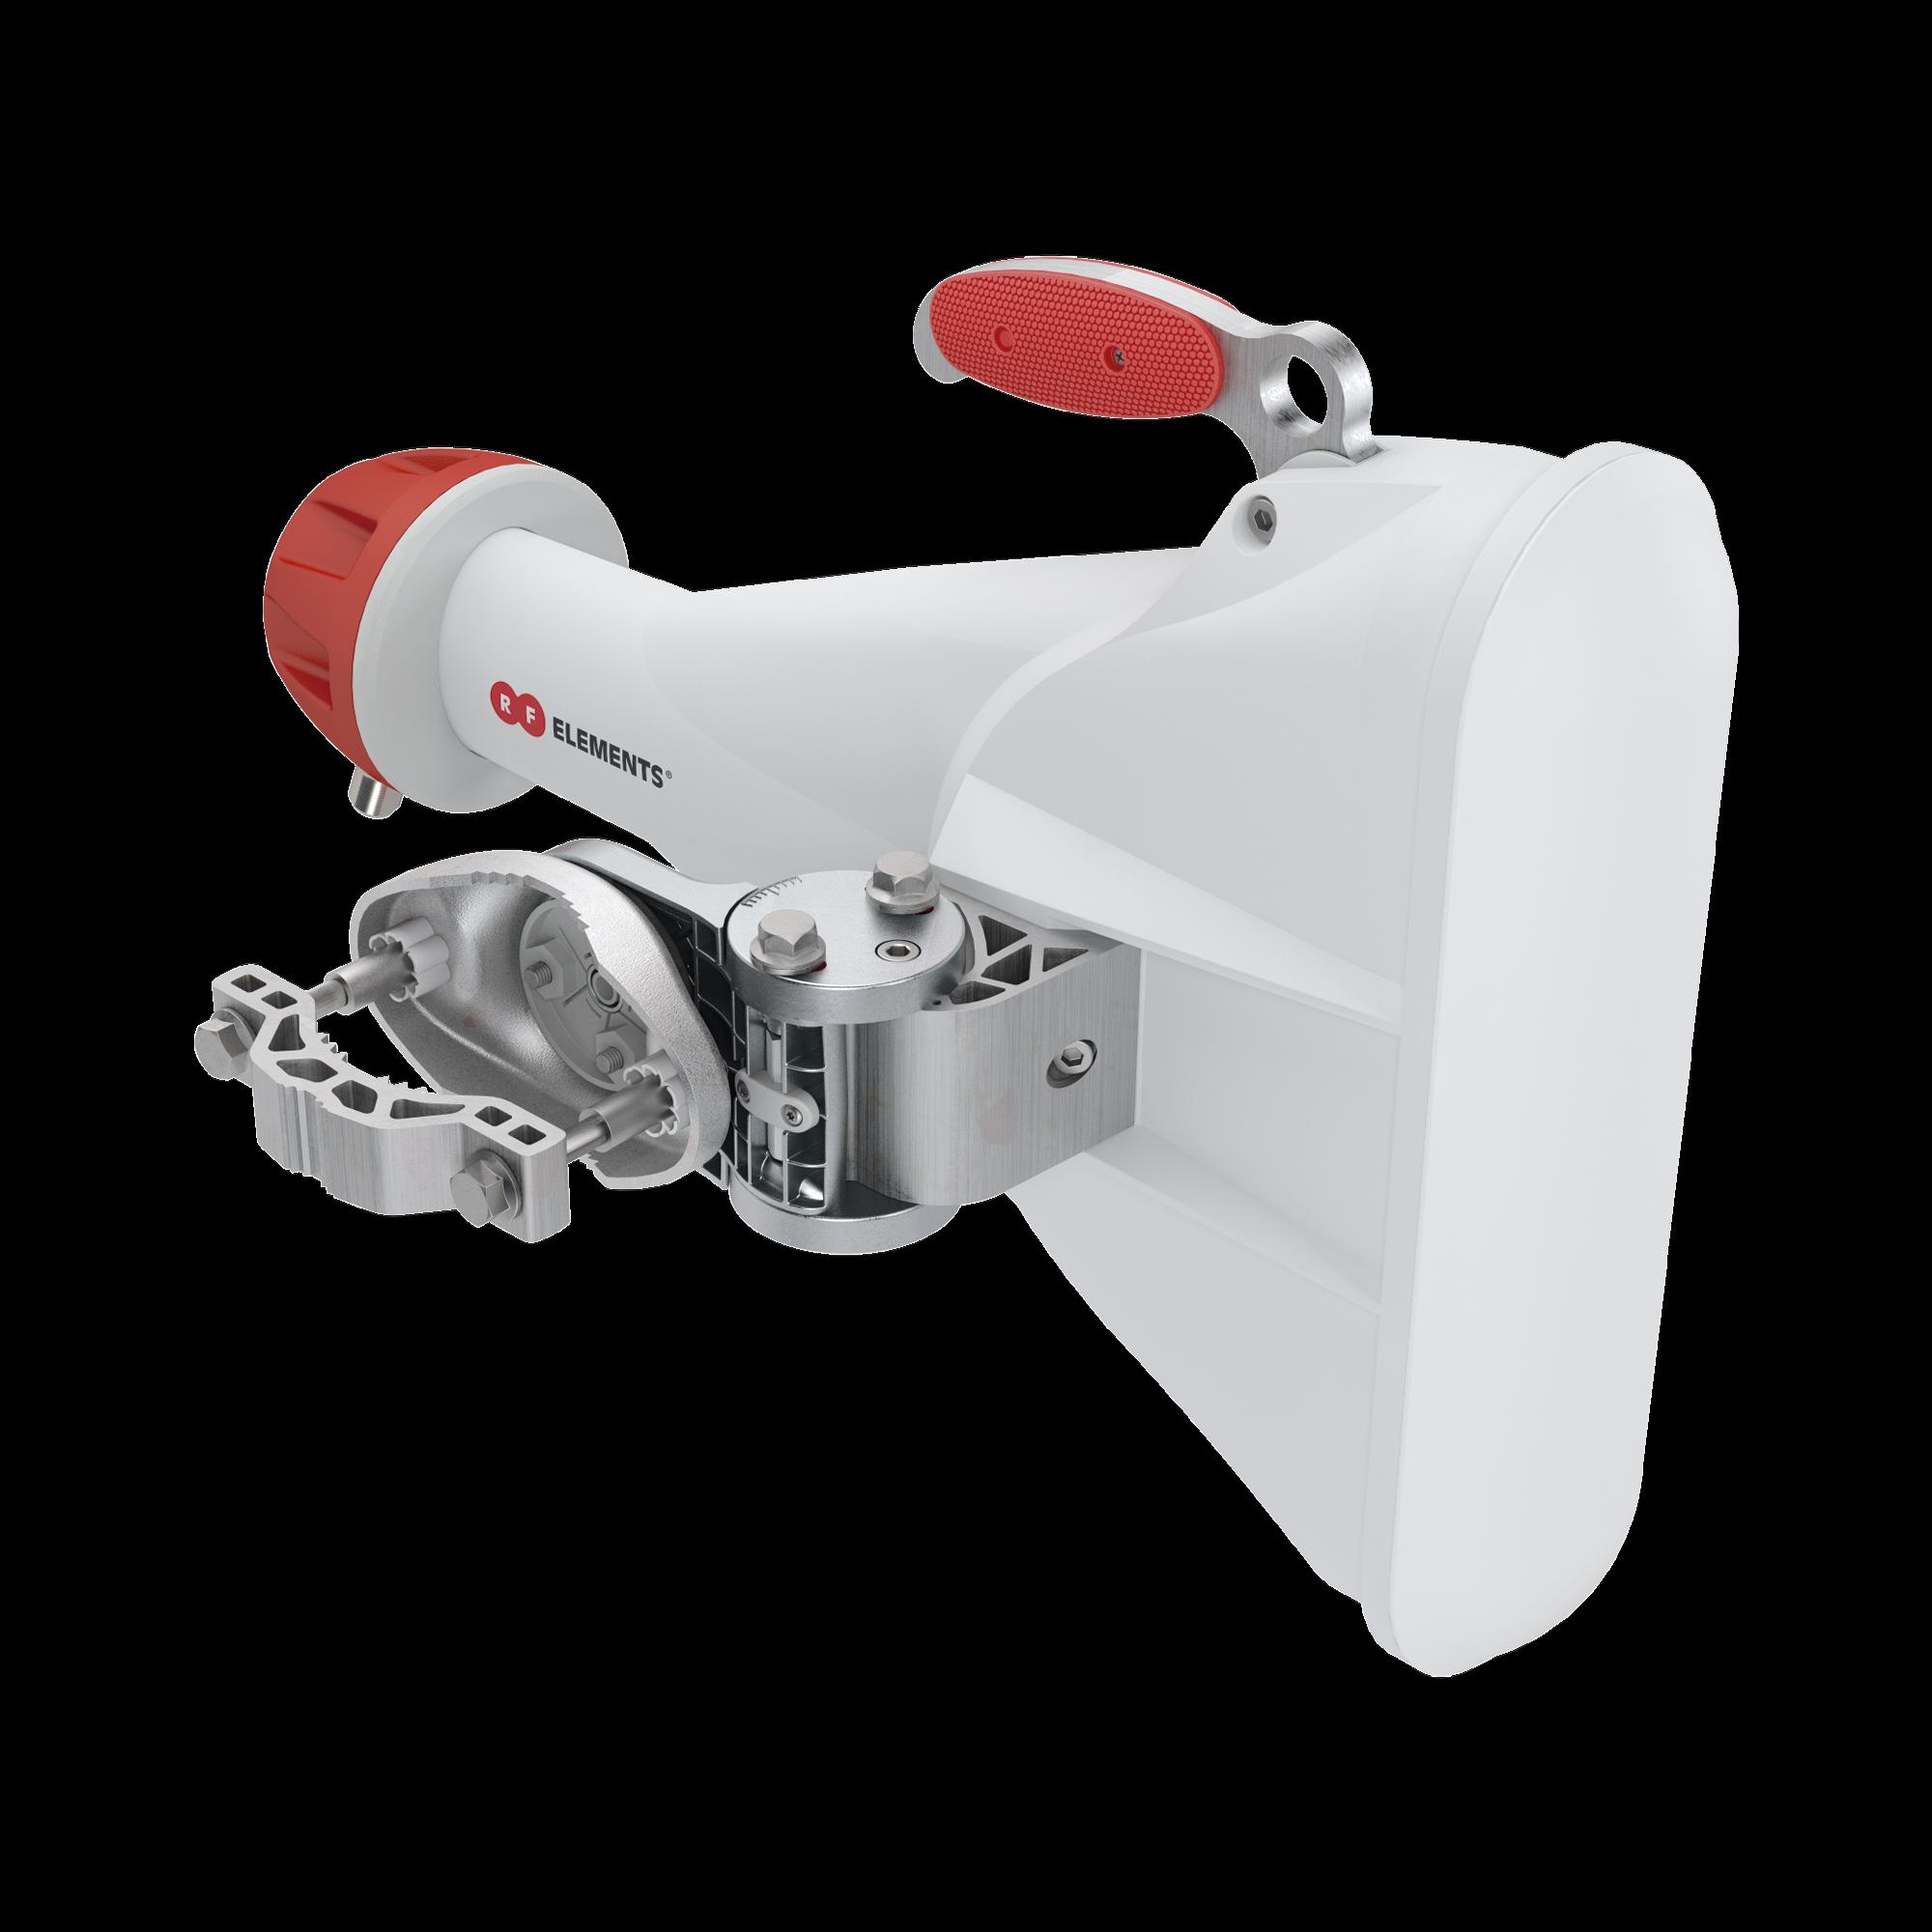 Antena Sectorial Asimétrica Carrier Class apertura 60 grados tipo cuerno 17 dBi 5180-6000 MHz conectores tipo N hembra